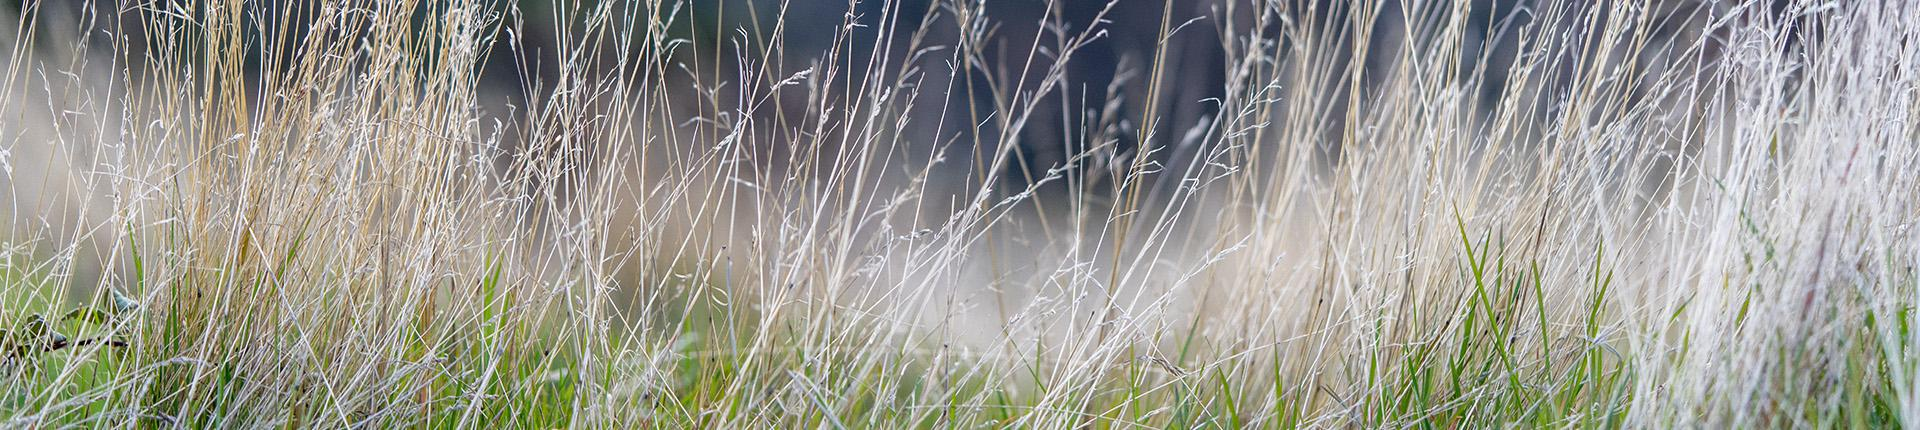 photo herbe champs au printemps